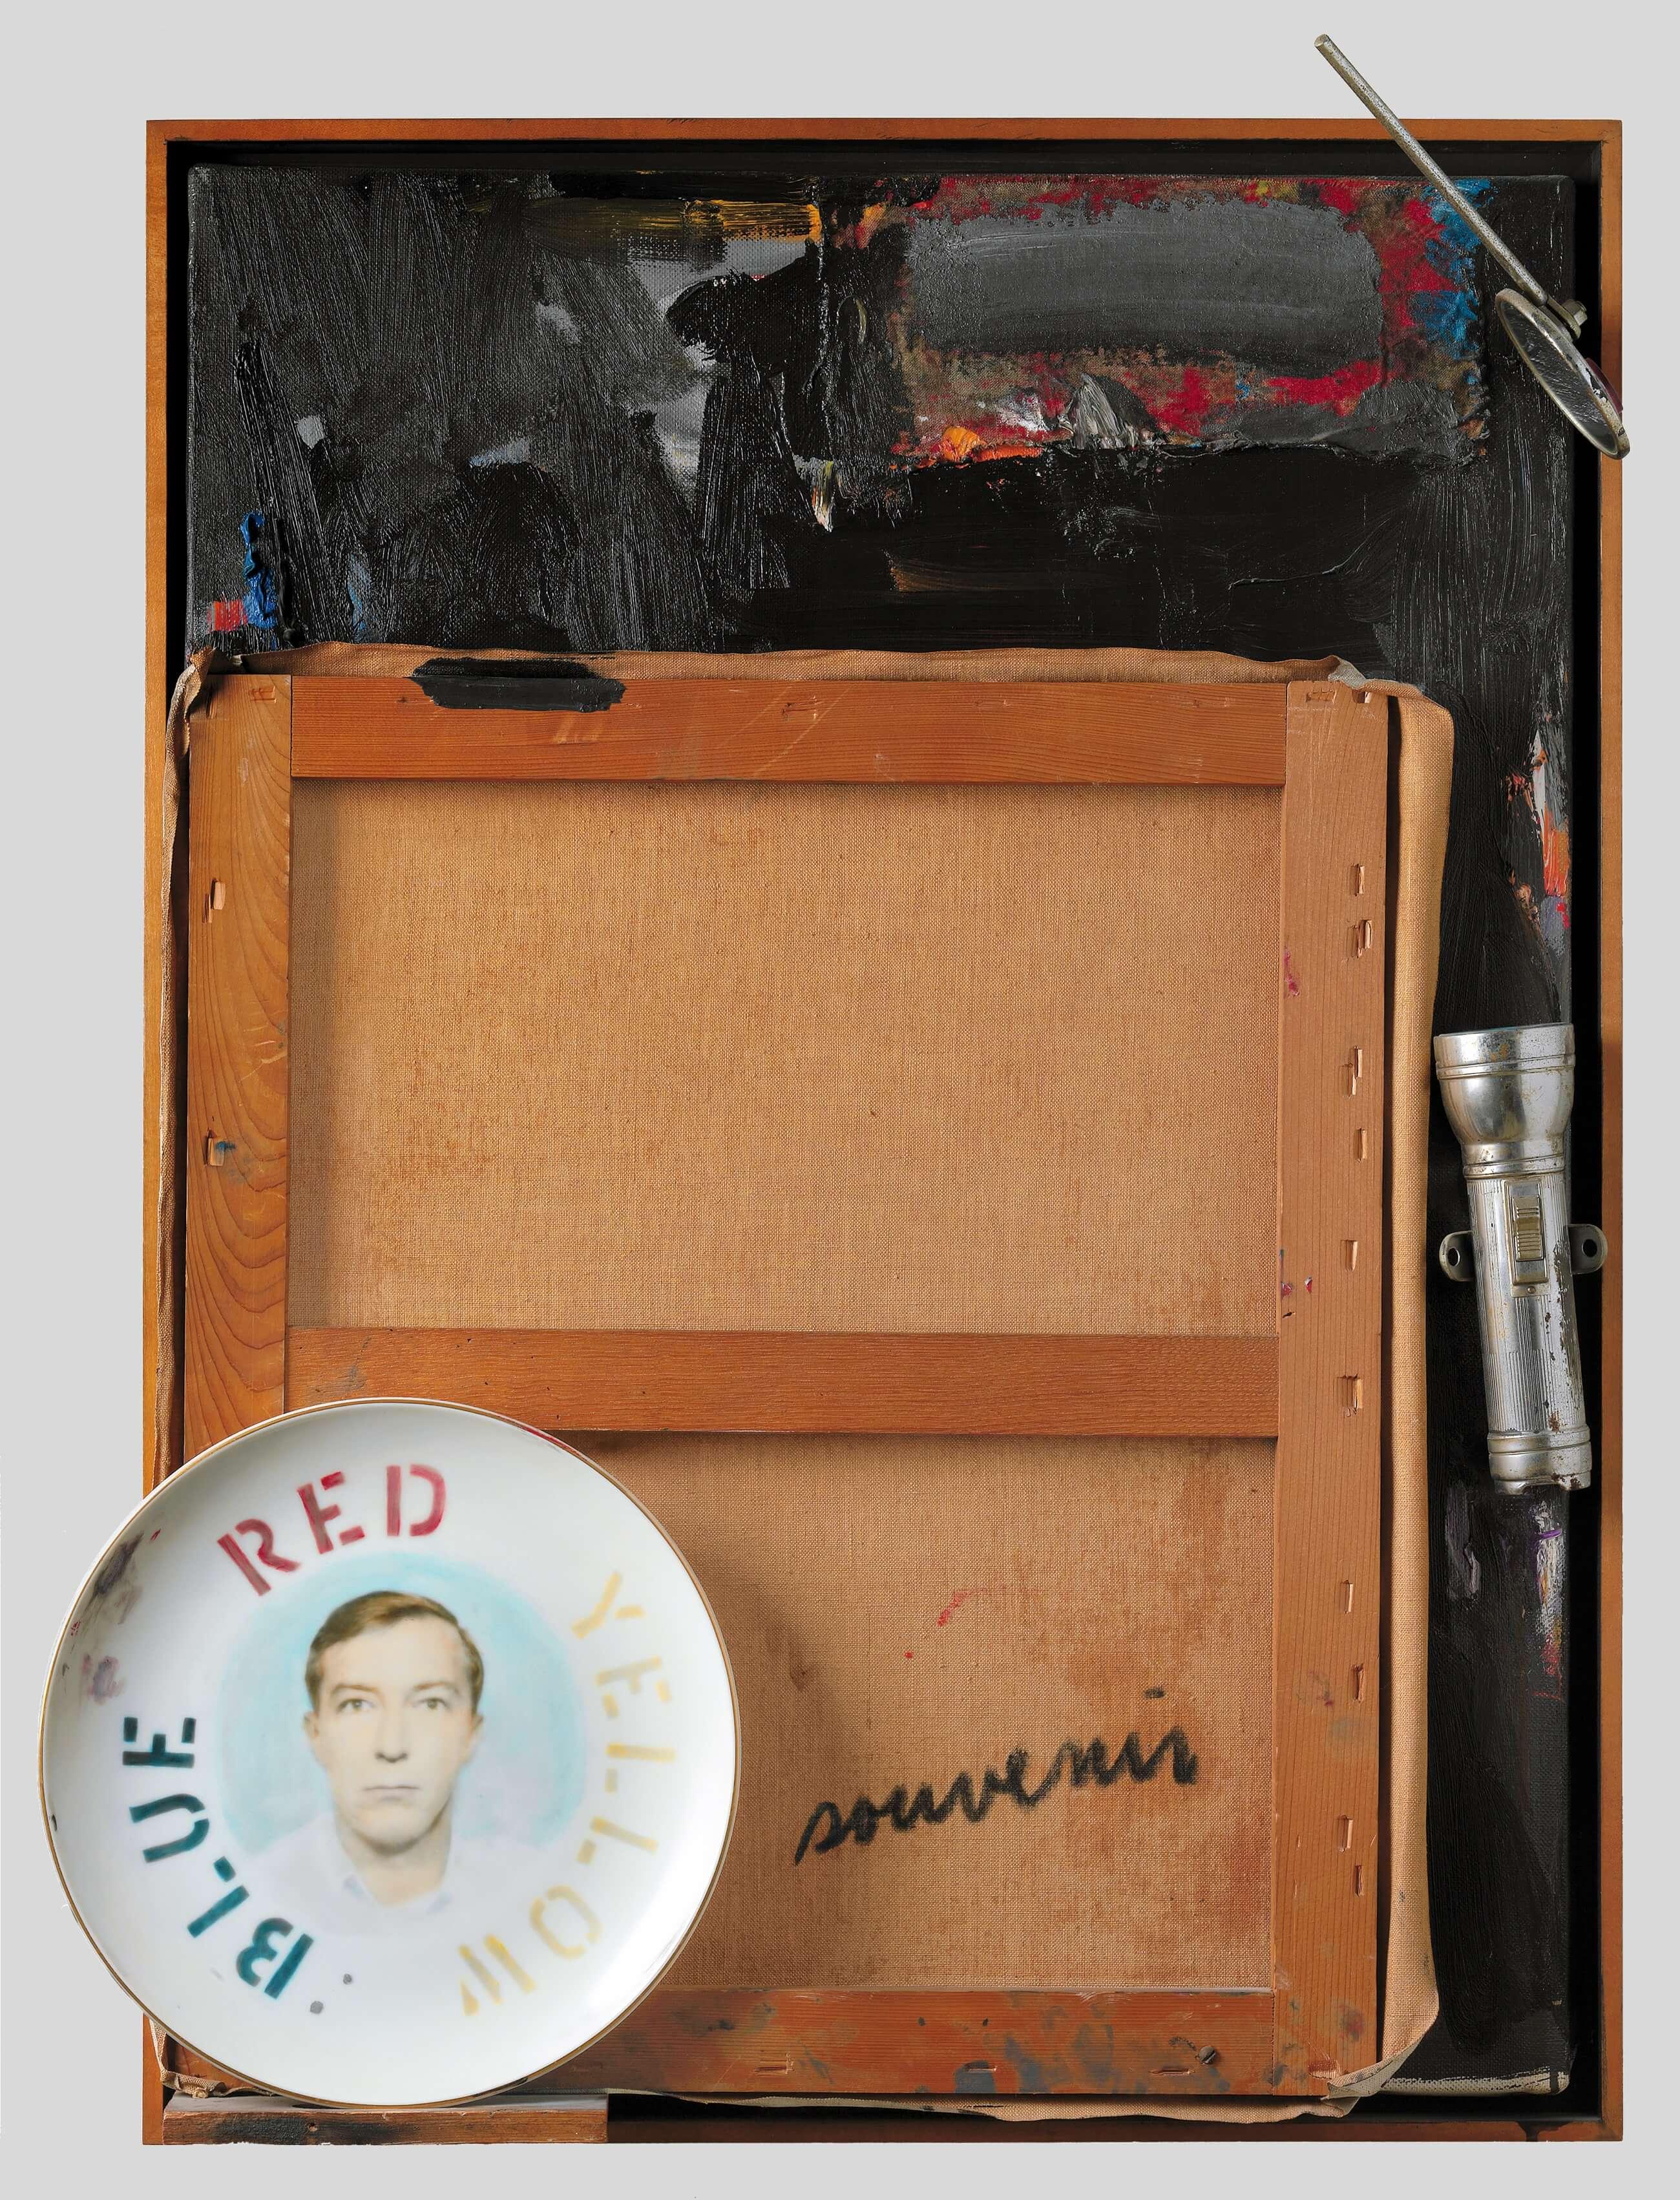 Souvenir 2, 1964, by Jasper Johns